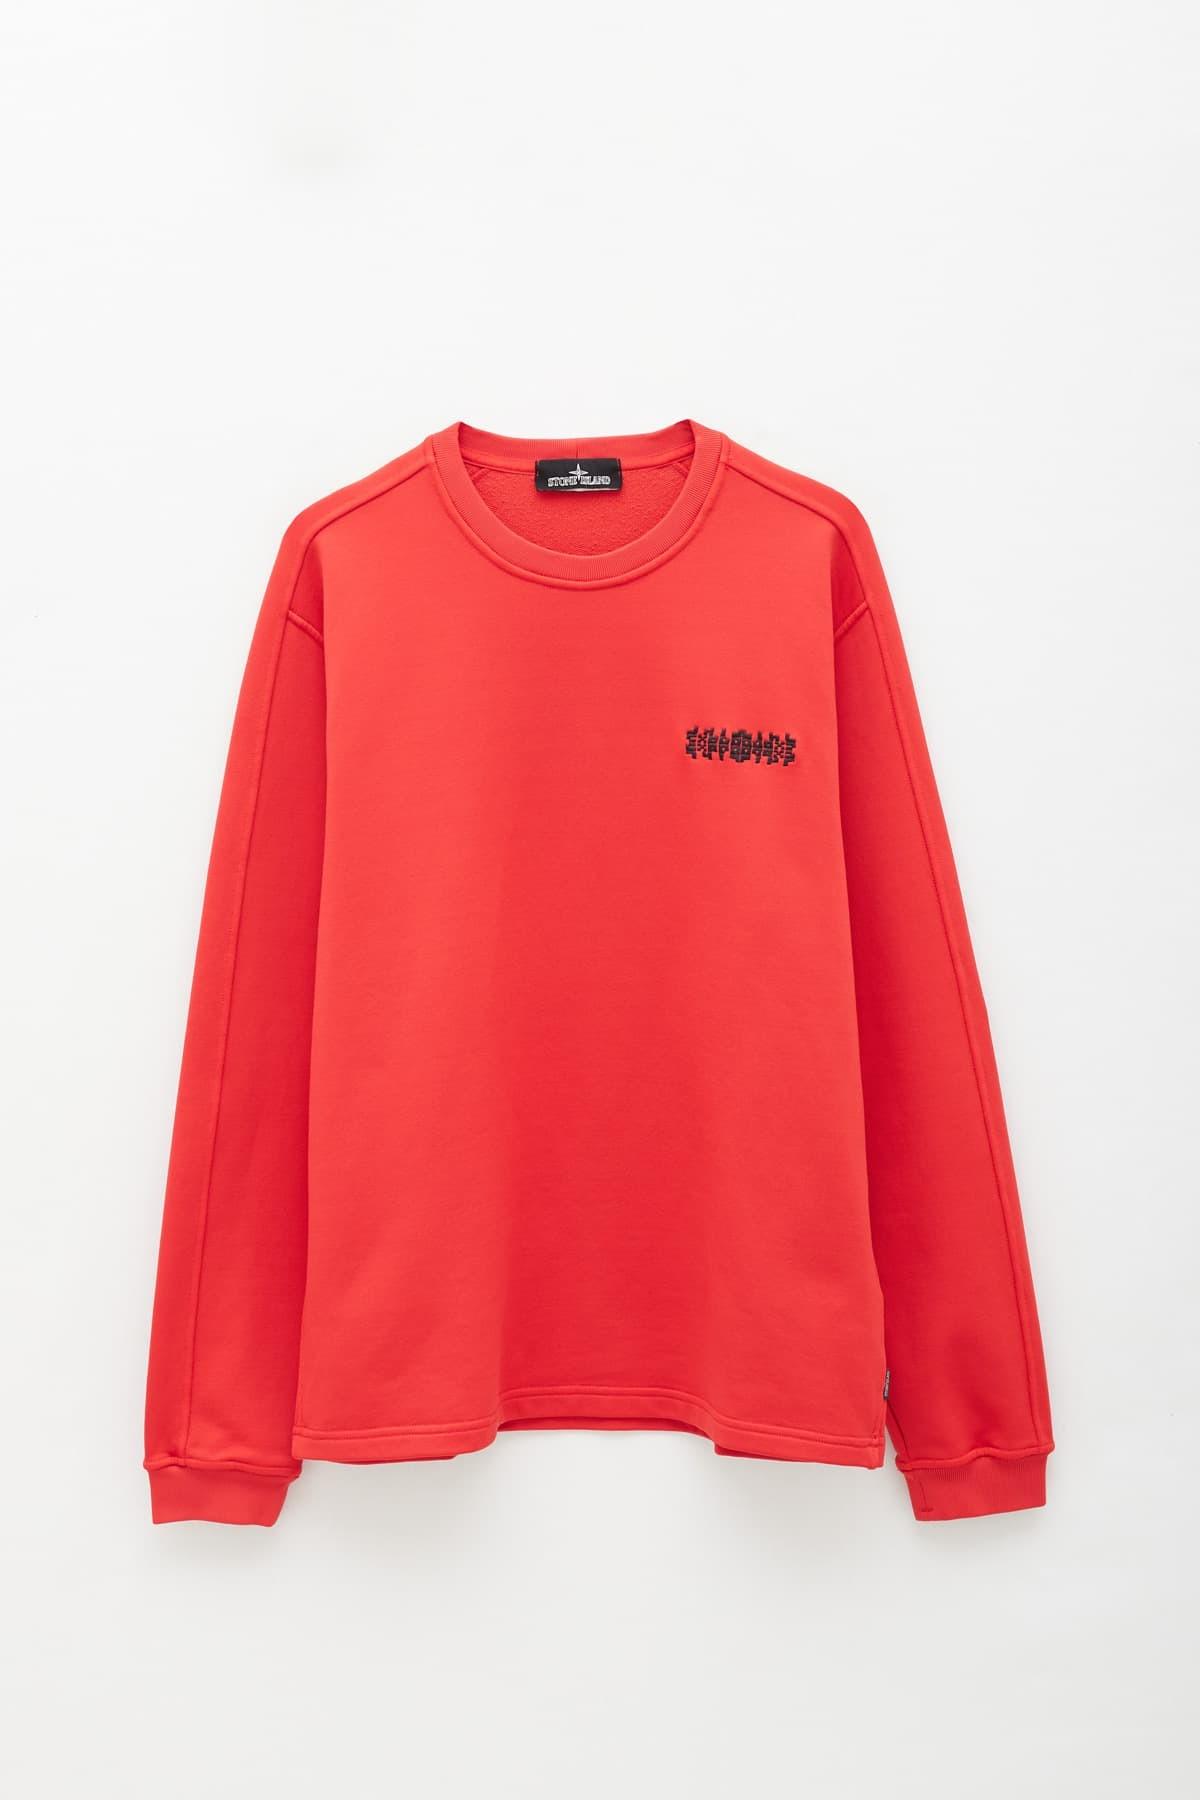 Shop Our Legacy Blue Coastal Wash Spiral Cut Trouser